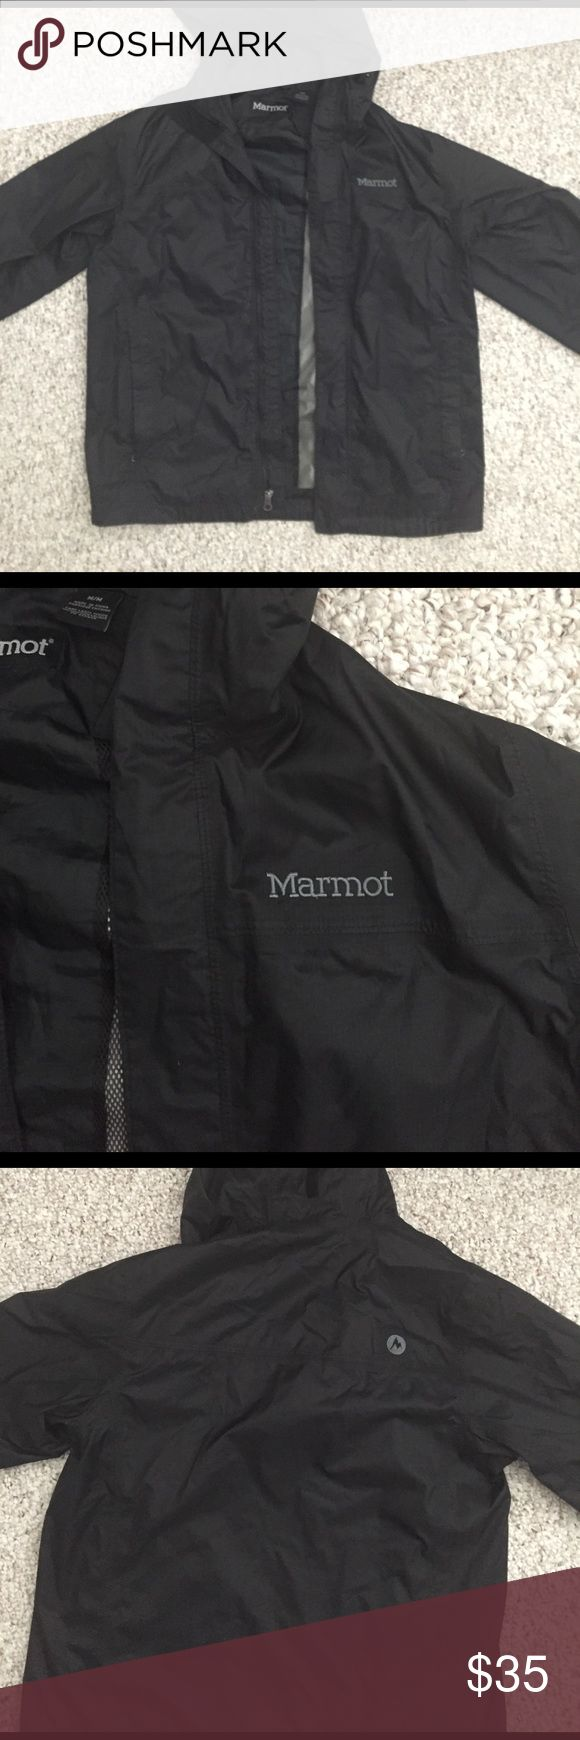 Marmot women's rain jacket Black marmot rain jacket. Women's size medium. Great condition! Marmot Jackets & Coats Utility Jackets